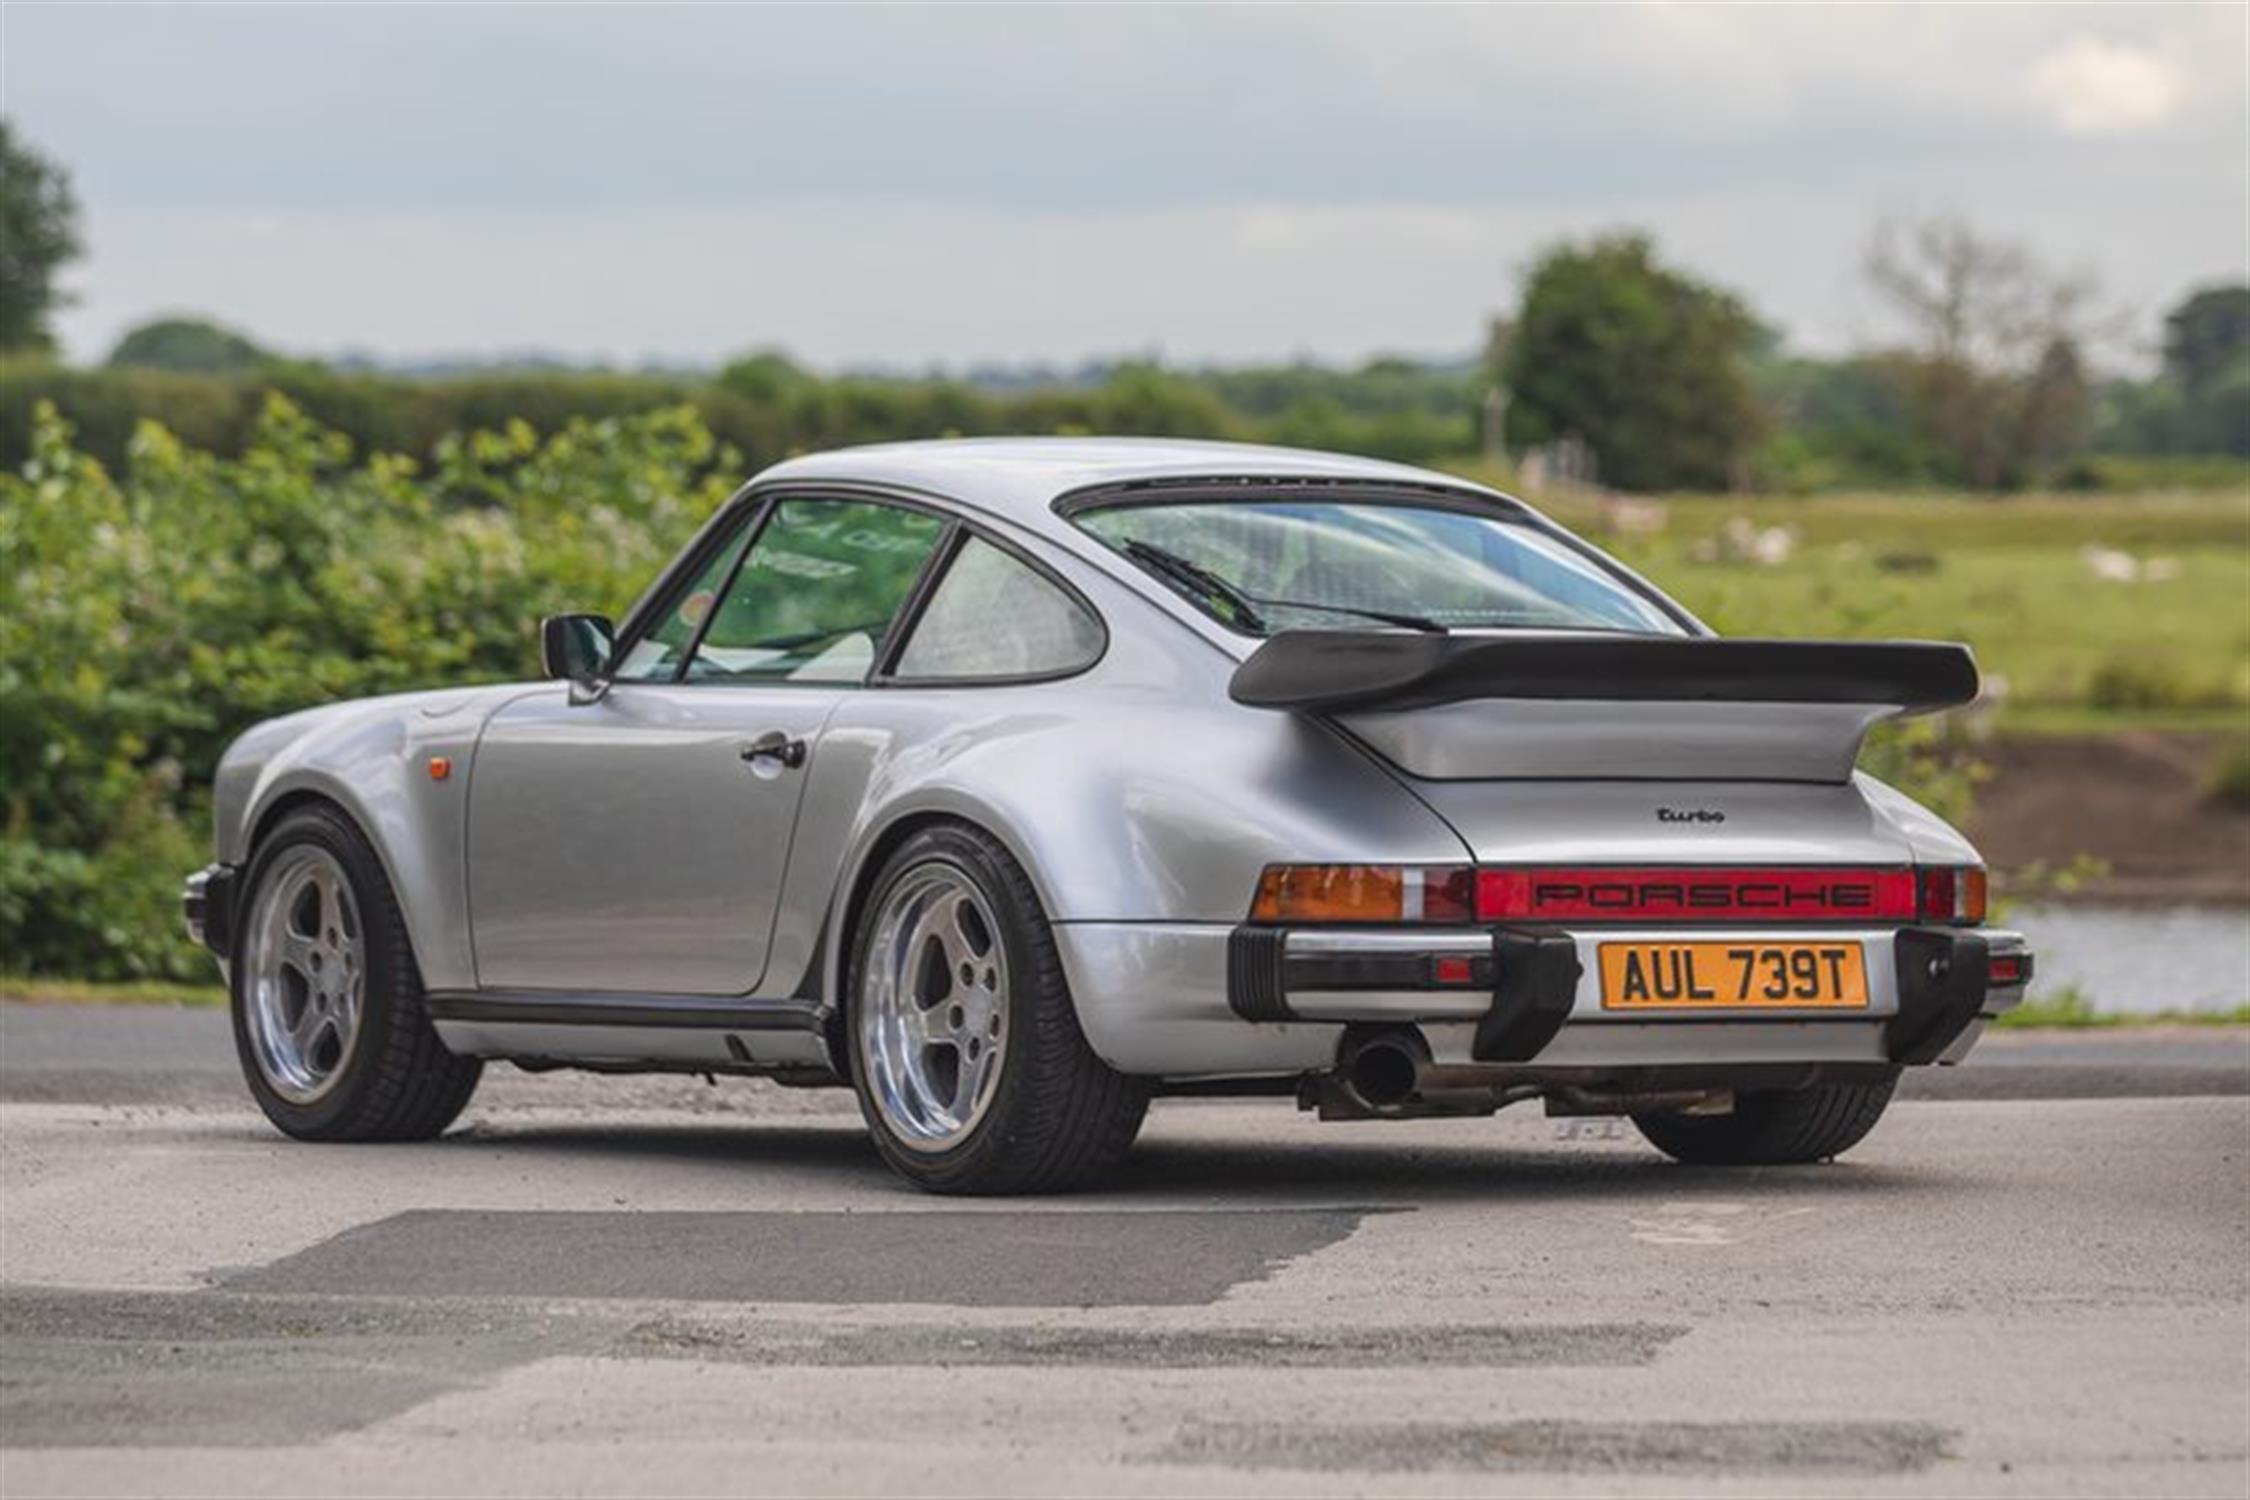 1979 Porsche 911 Turbo 3.3-Litre - Image 8 of 10